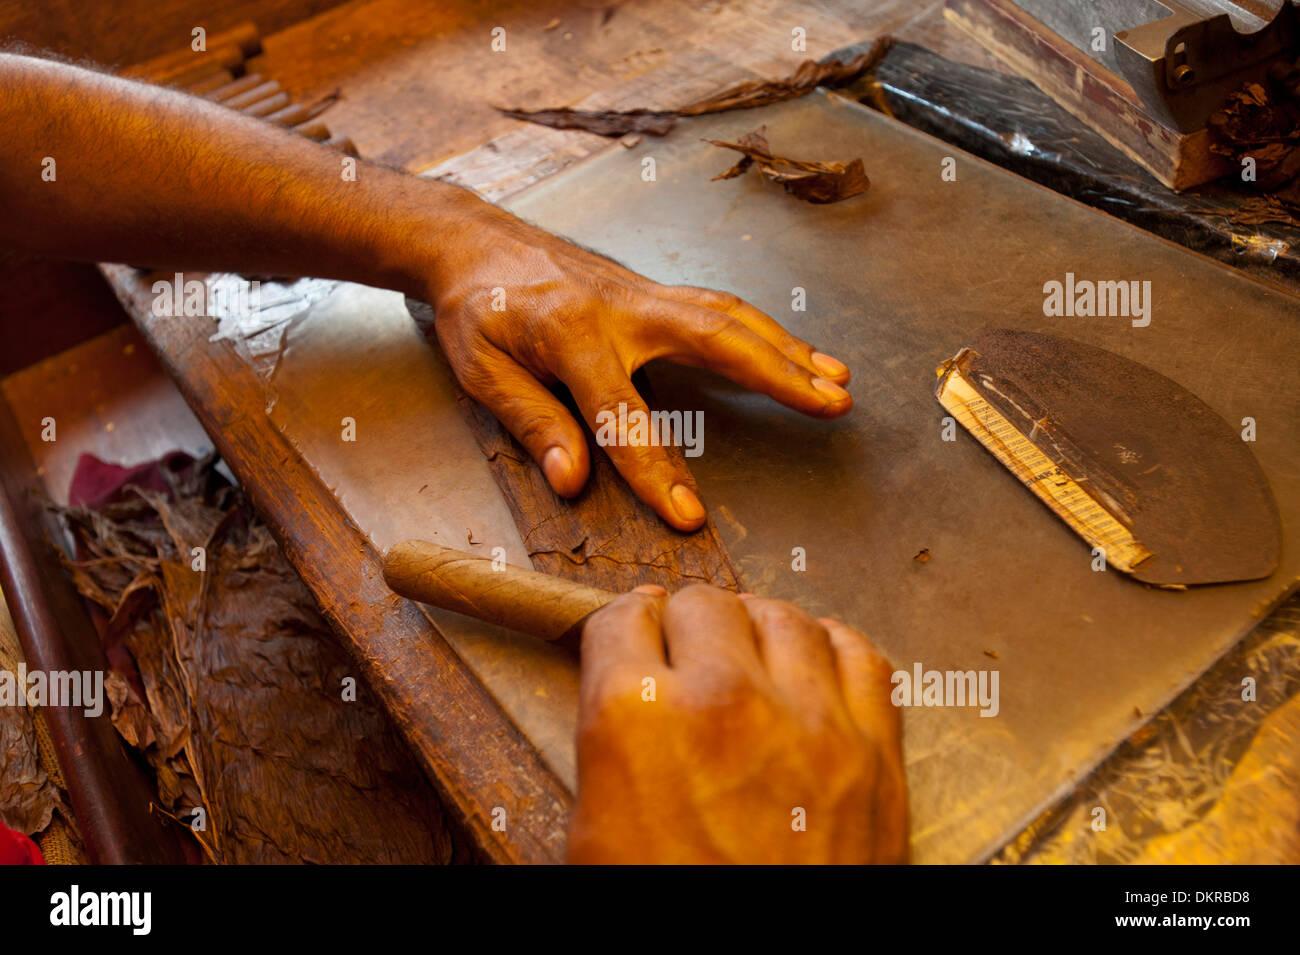 Dominican Republic, production, craft, cigars, cigar, Caribbean, Santo Domingo, tobacco, hands, roll, - Stock Image